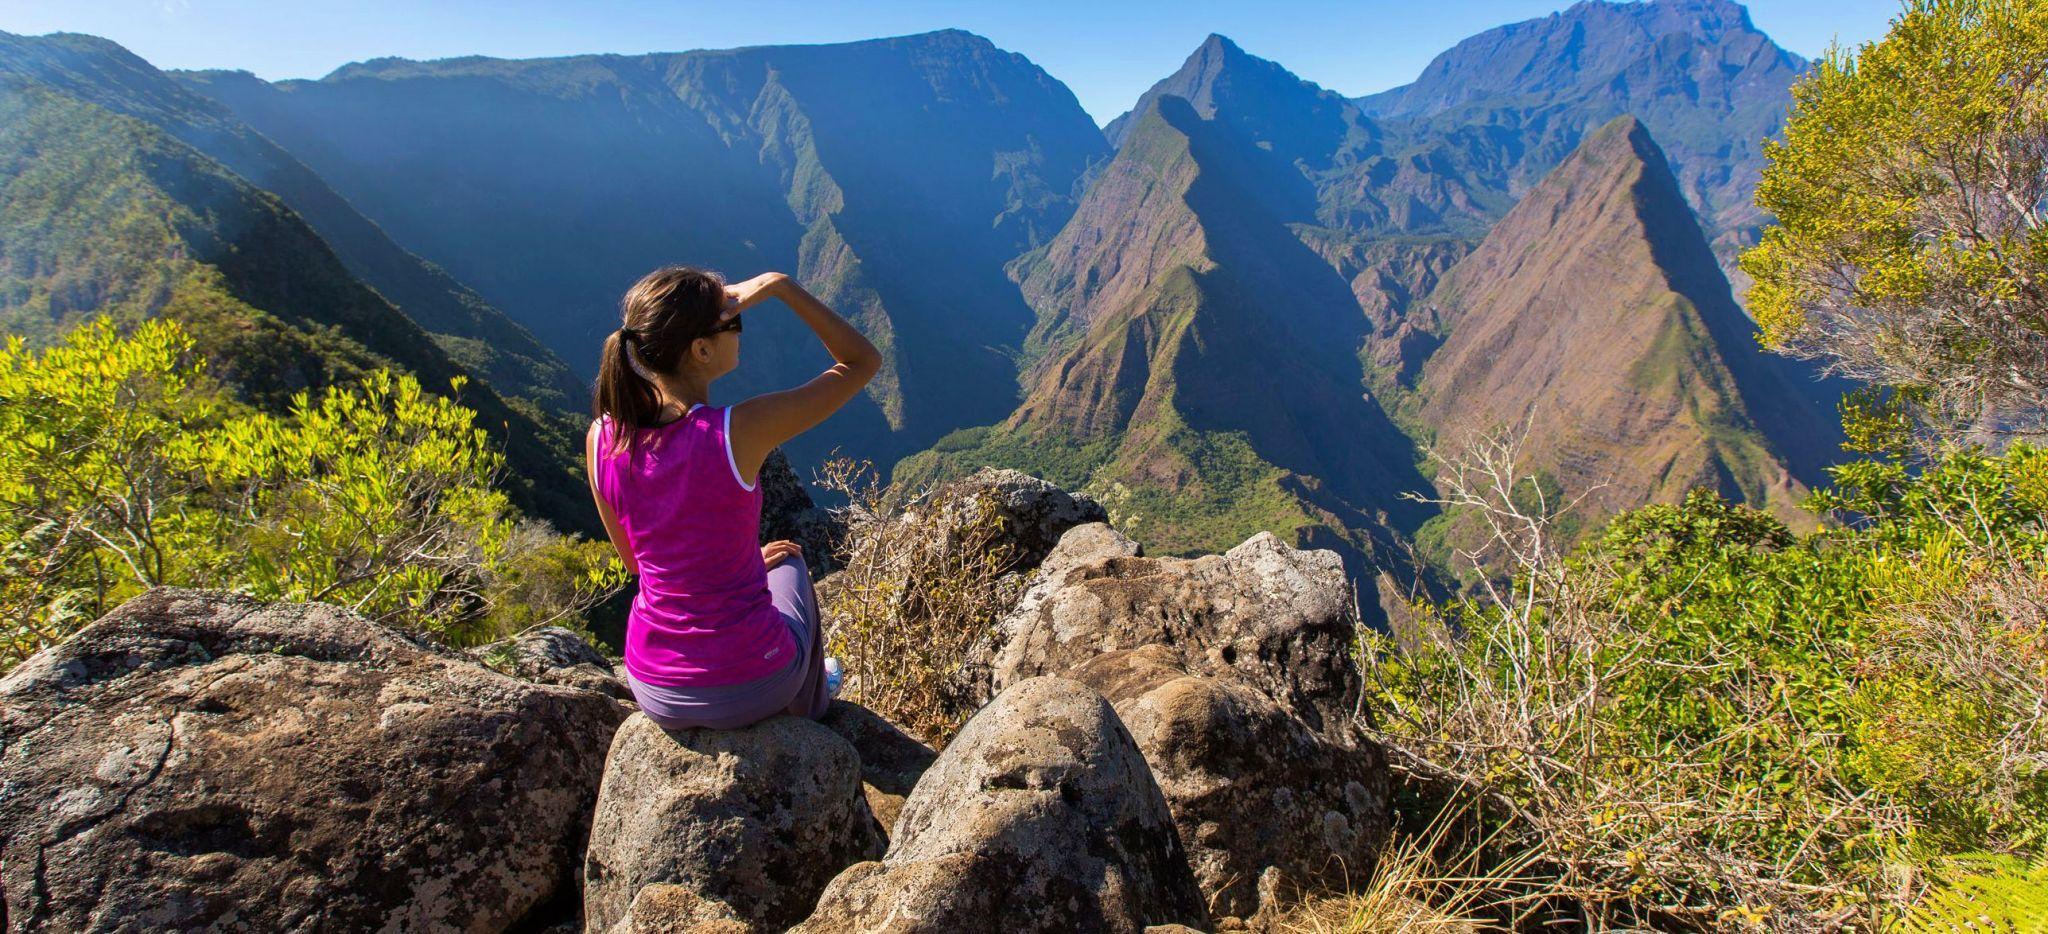 Frau genießt den Ausblick von dem Berg Montagne Mafate auf La Réunion